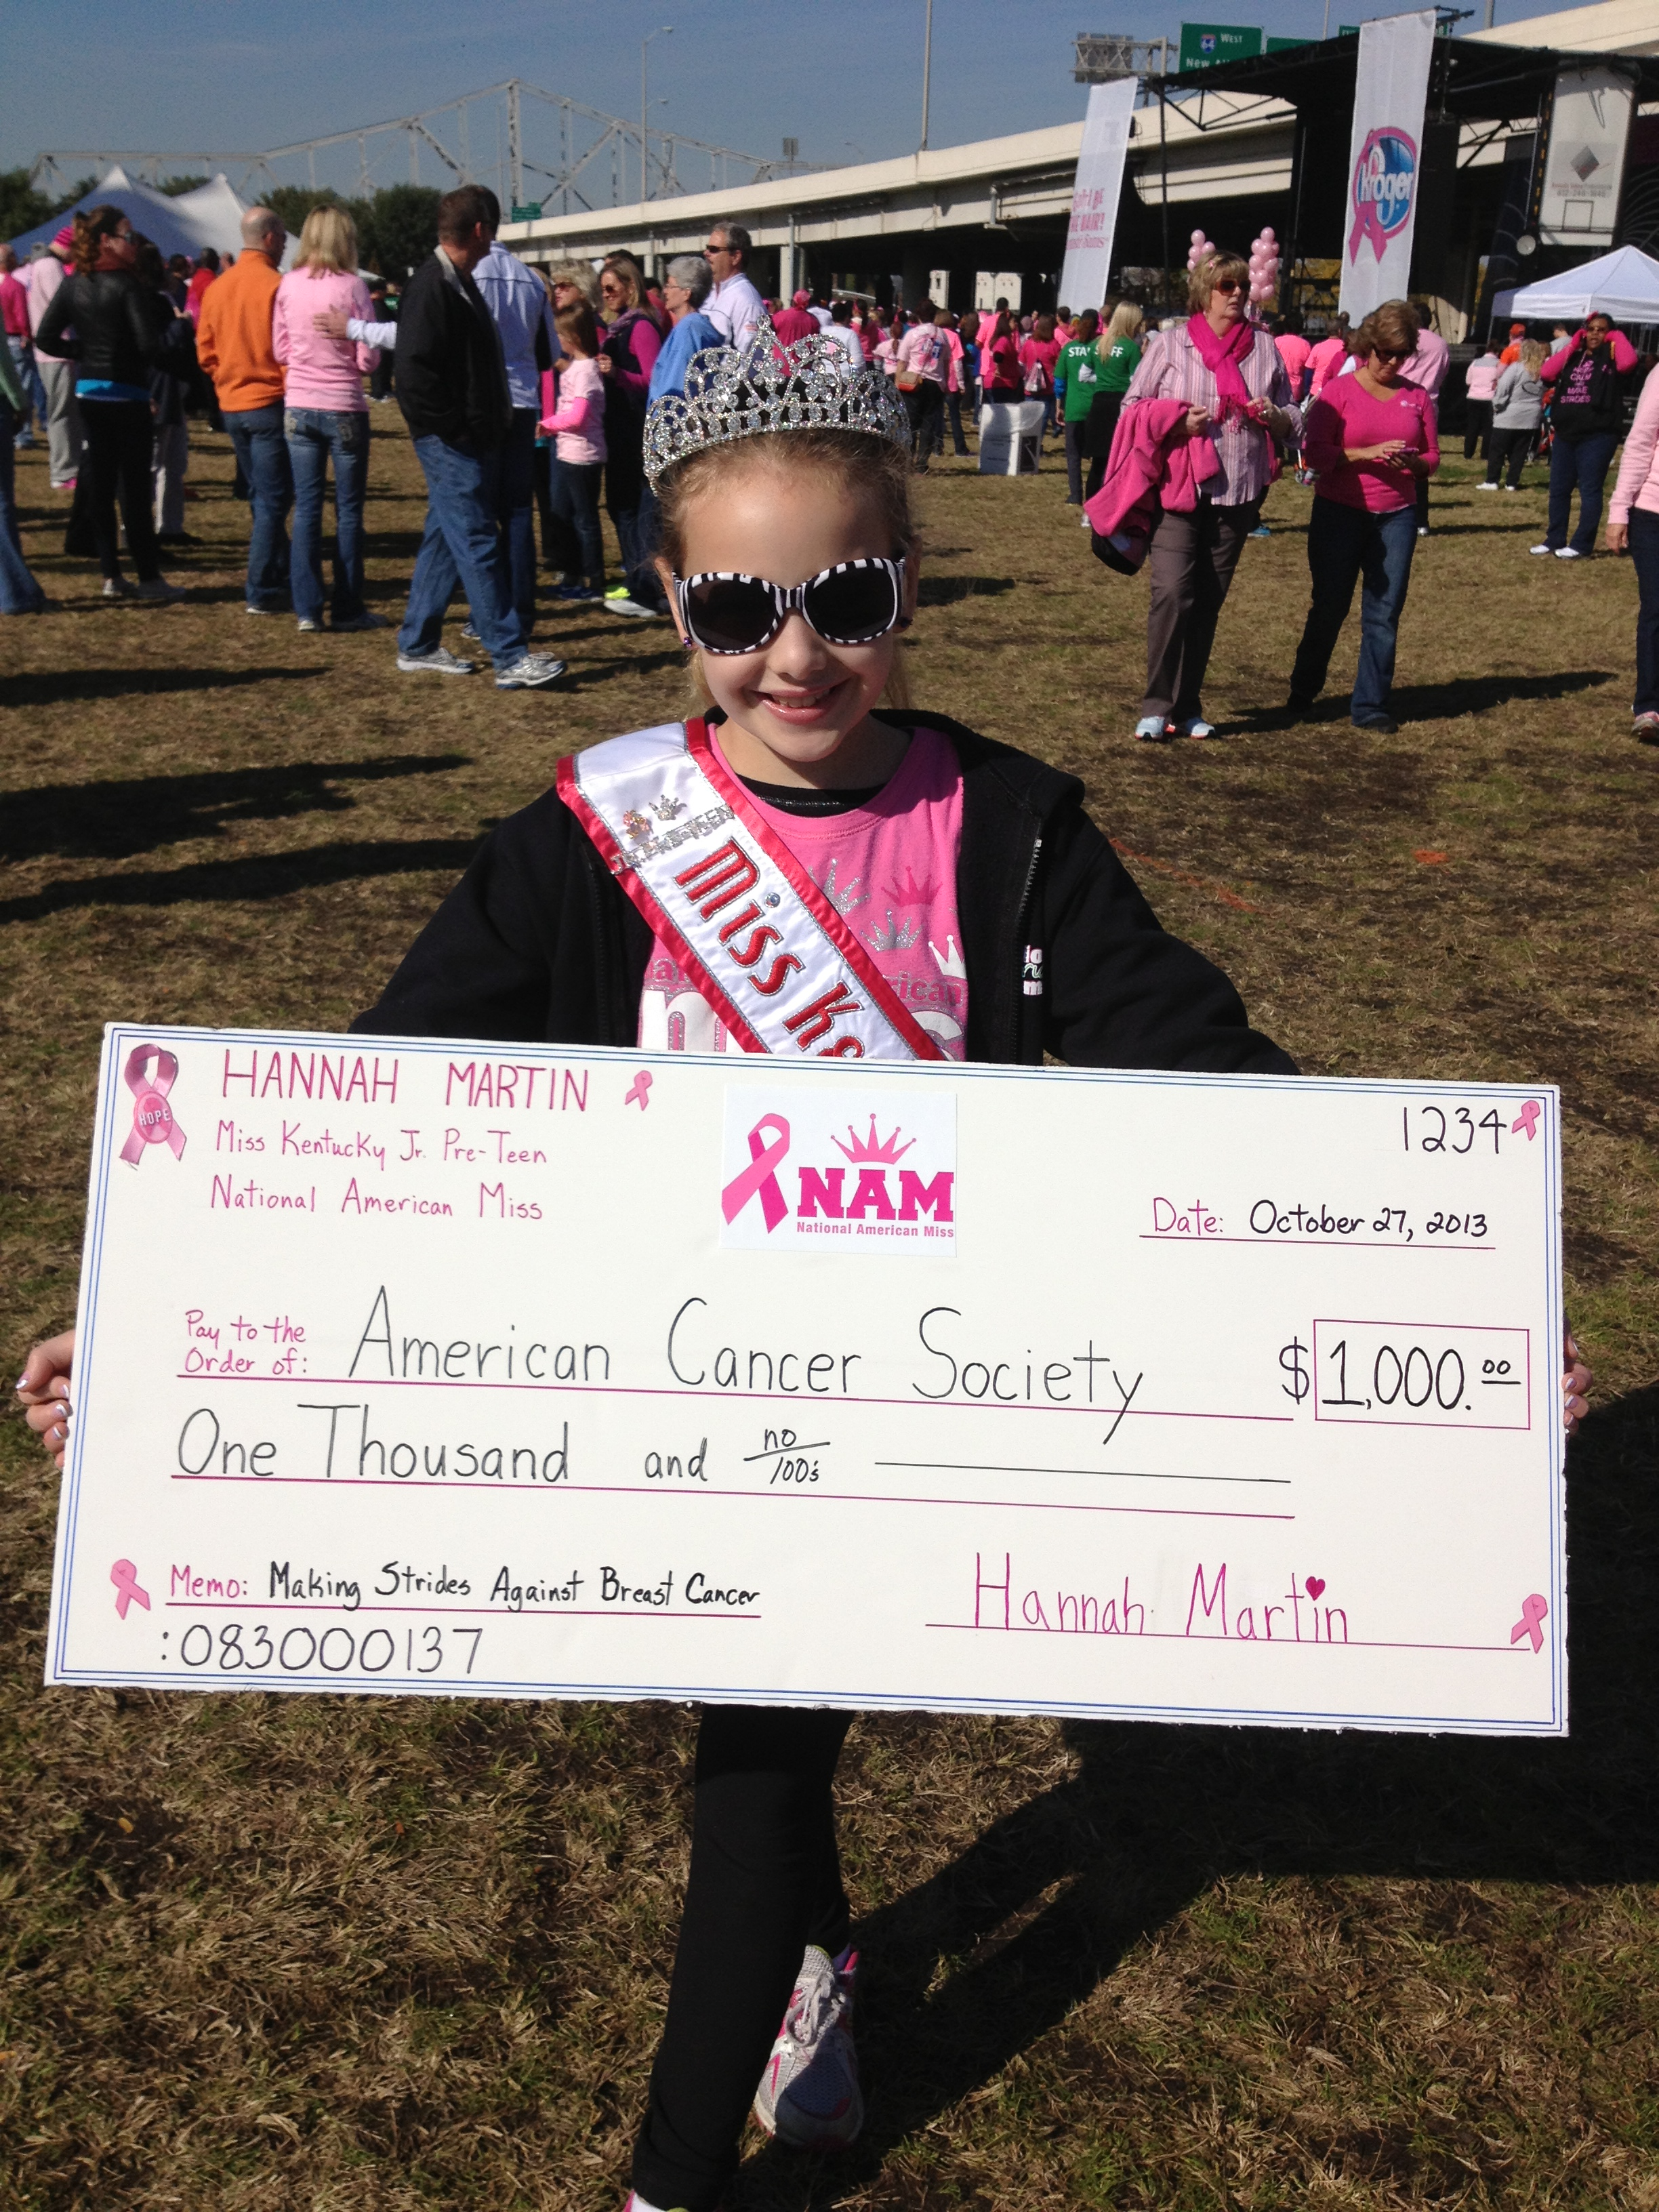 Hannah_Martin_KY_Jr_Preteen_Breast Cancer donation check